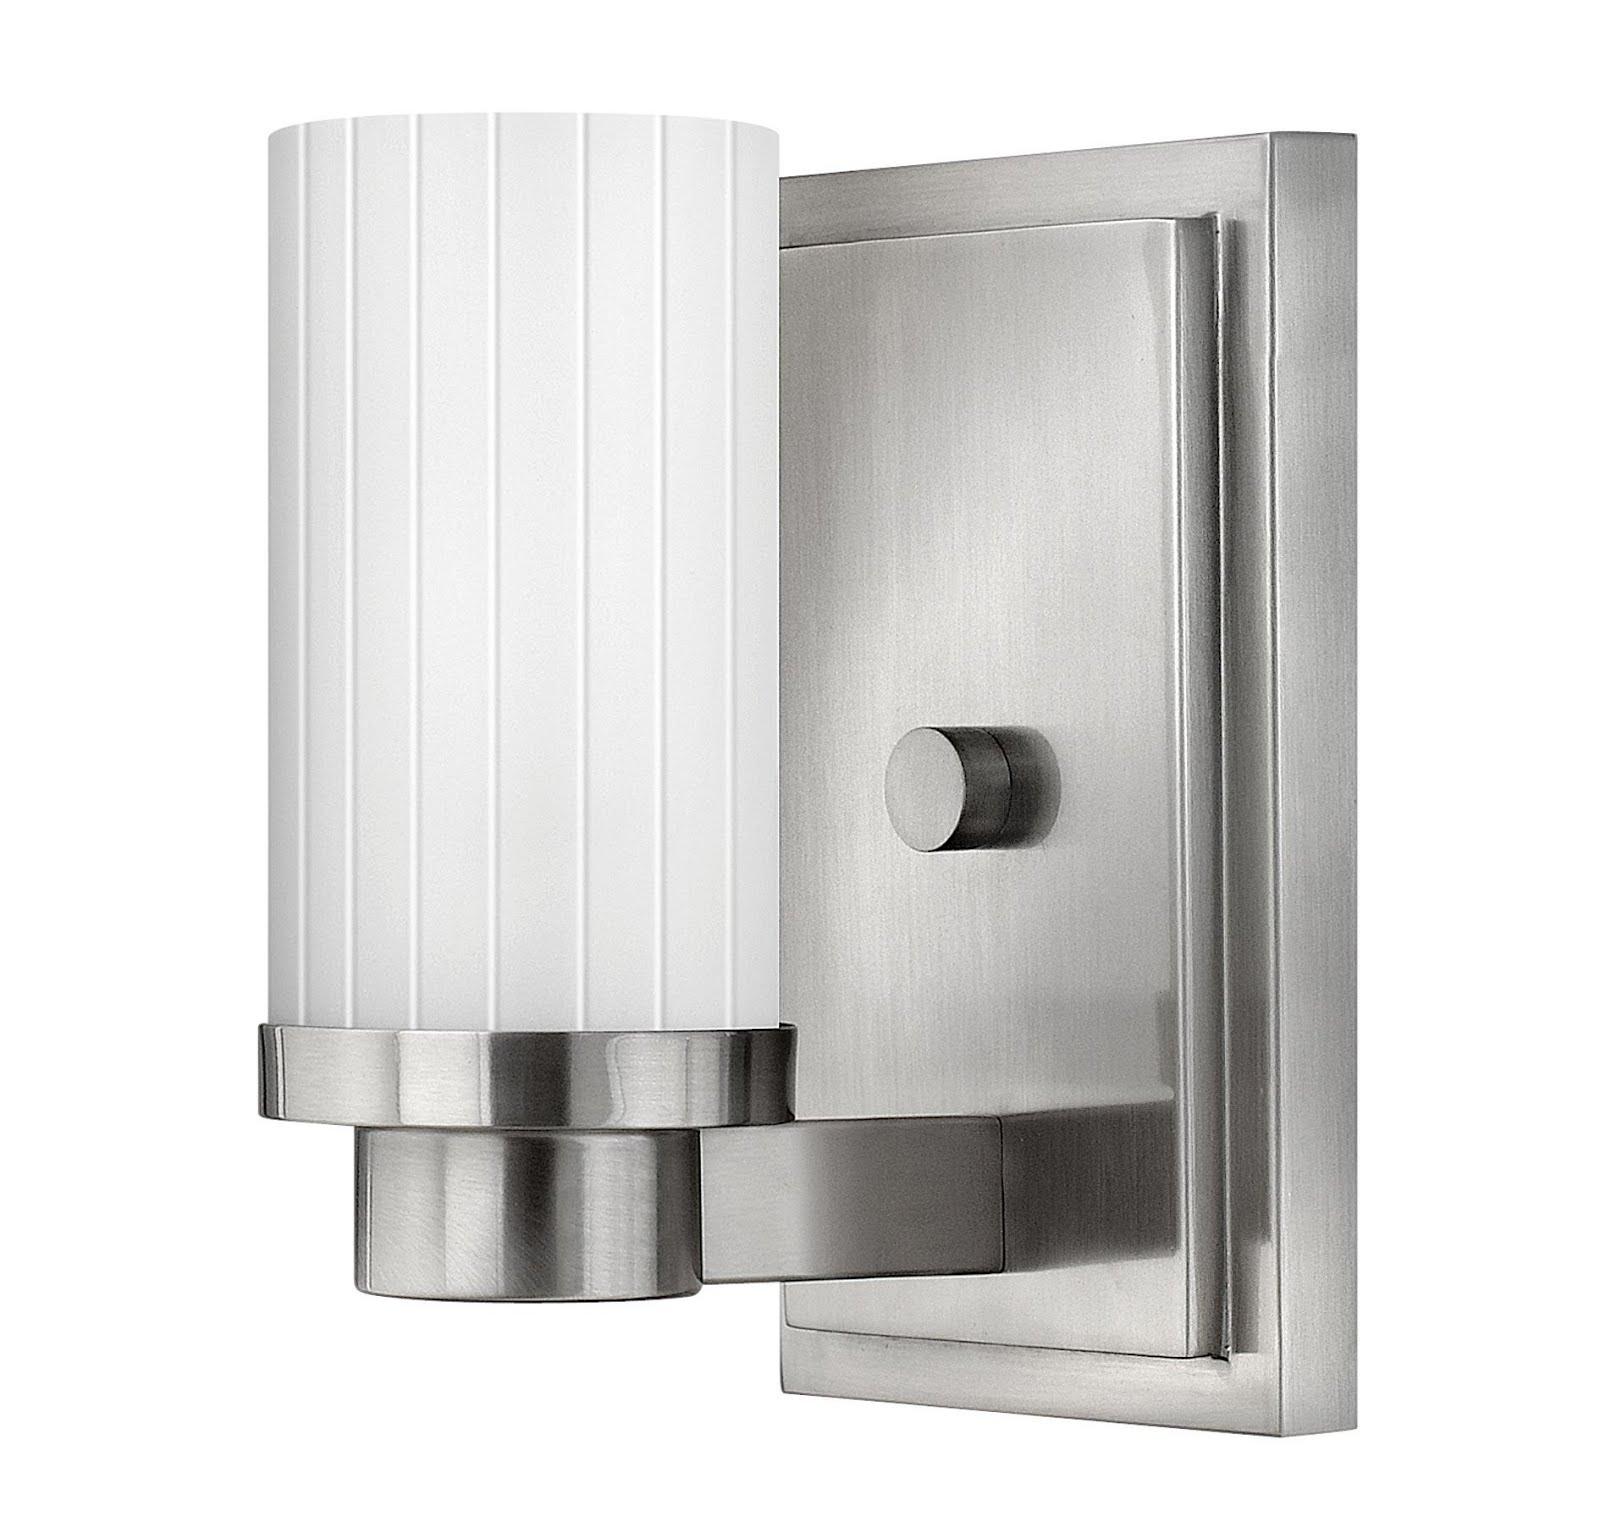 Mid Century Bathroom Light Fixtures: Mad For Mid-Century: Modern Bathroom Sconces